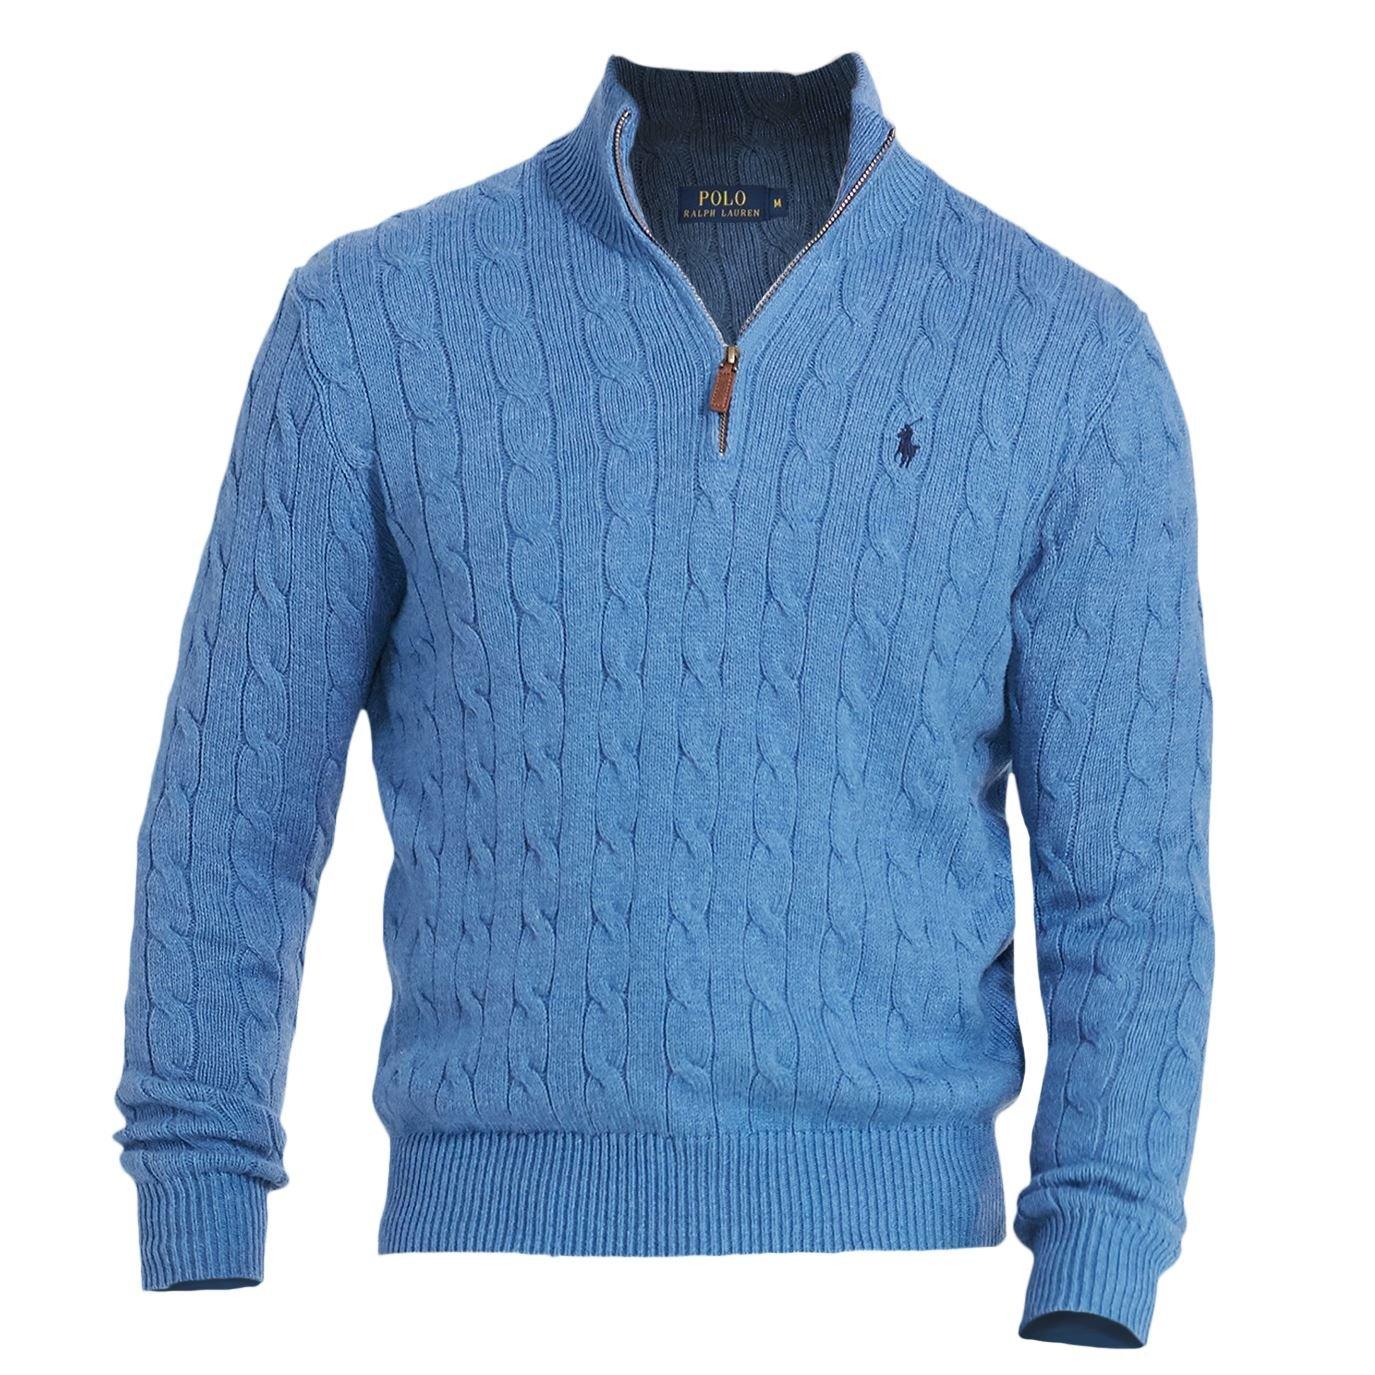 Polo Ralph Lauren Mens Ribbed Trim Mock Neck 1/2 Zip Sweater Blue L